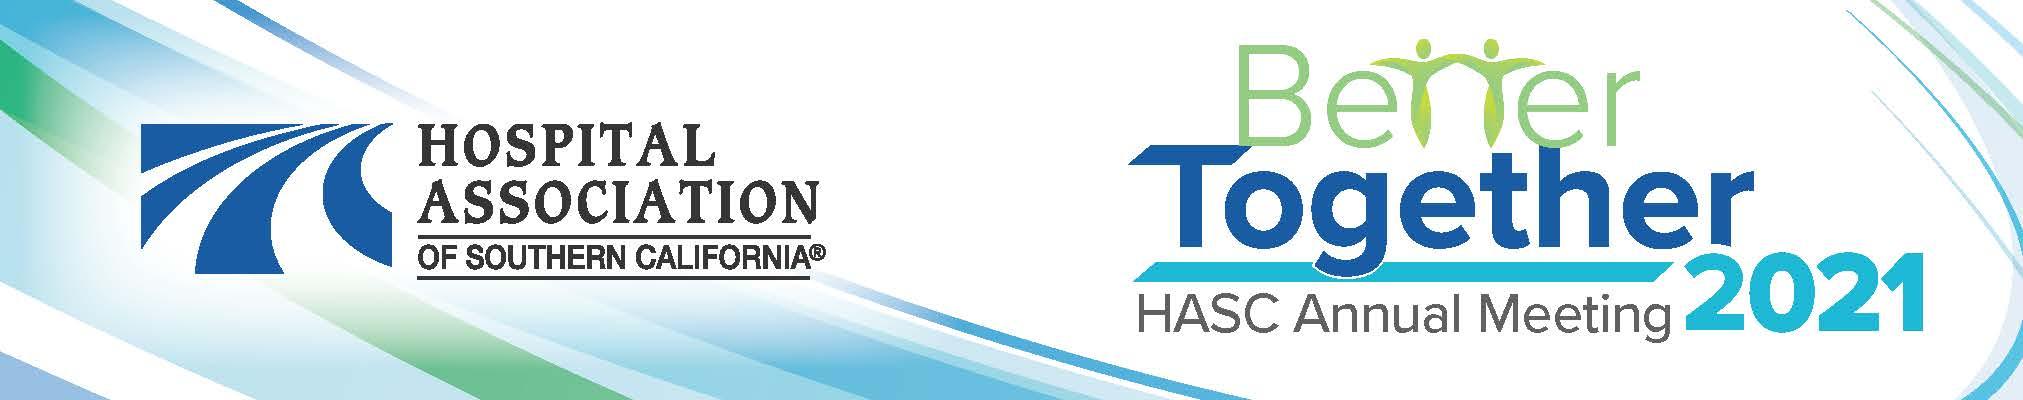 2021 HASC Virtual Annual Meeting Sponsorship